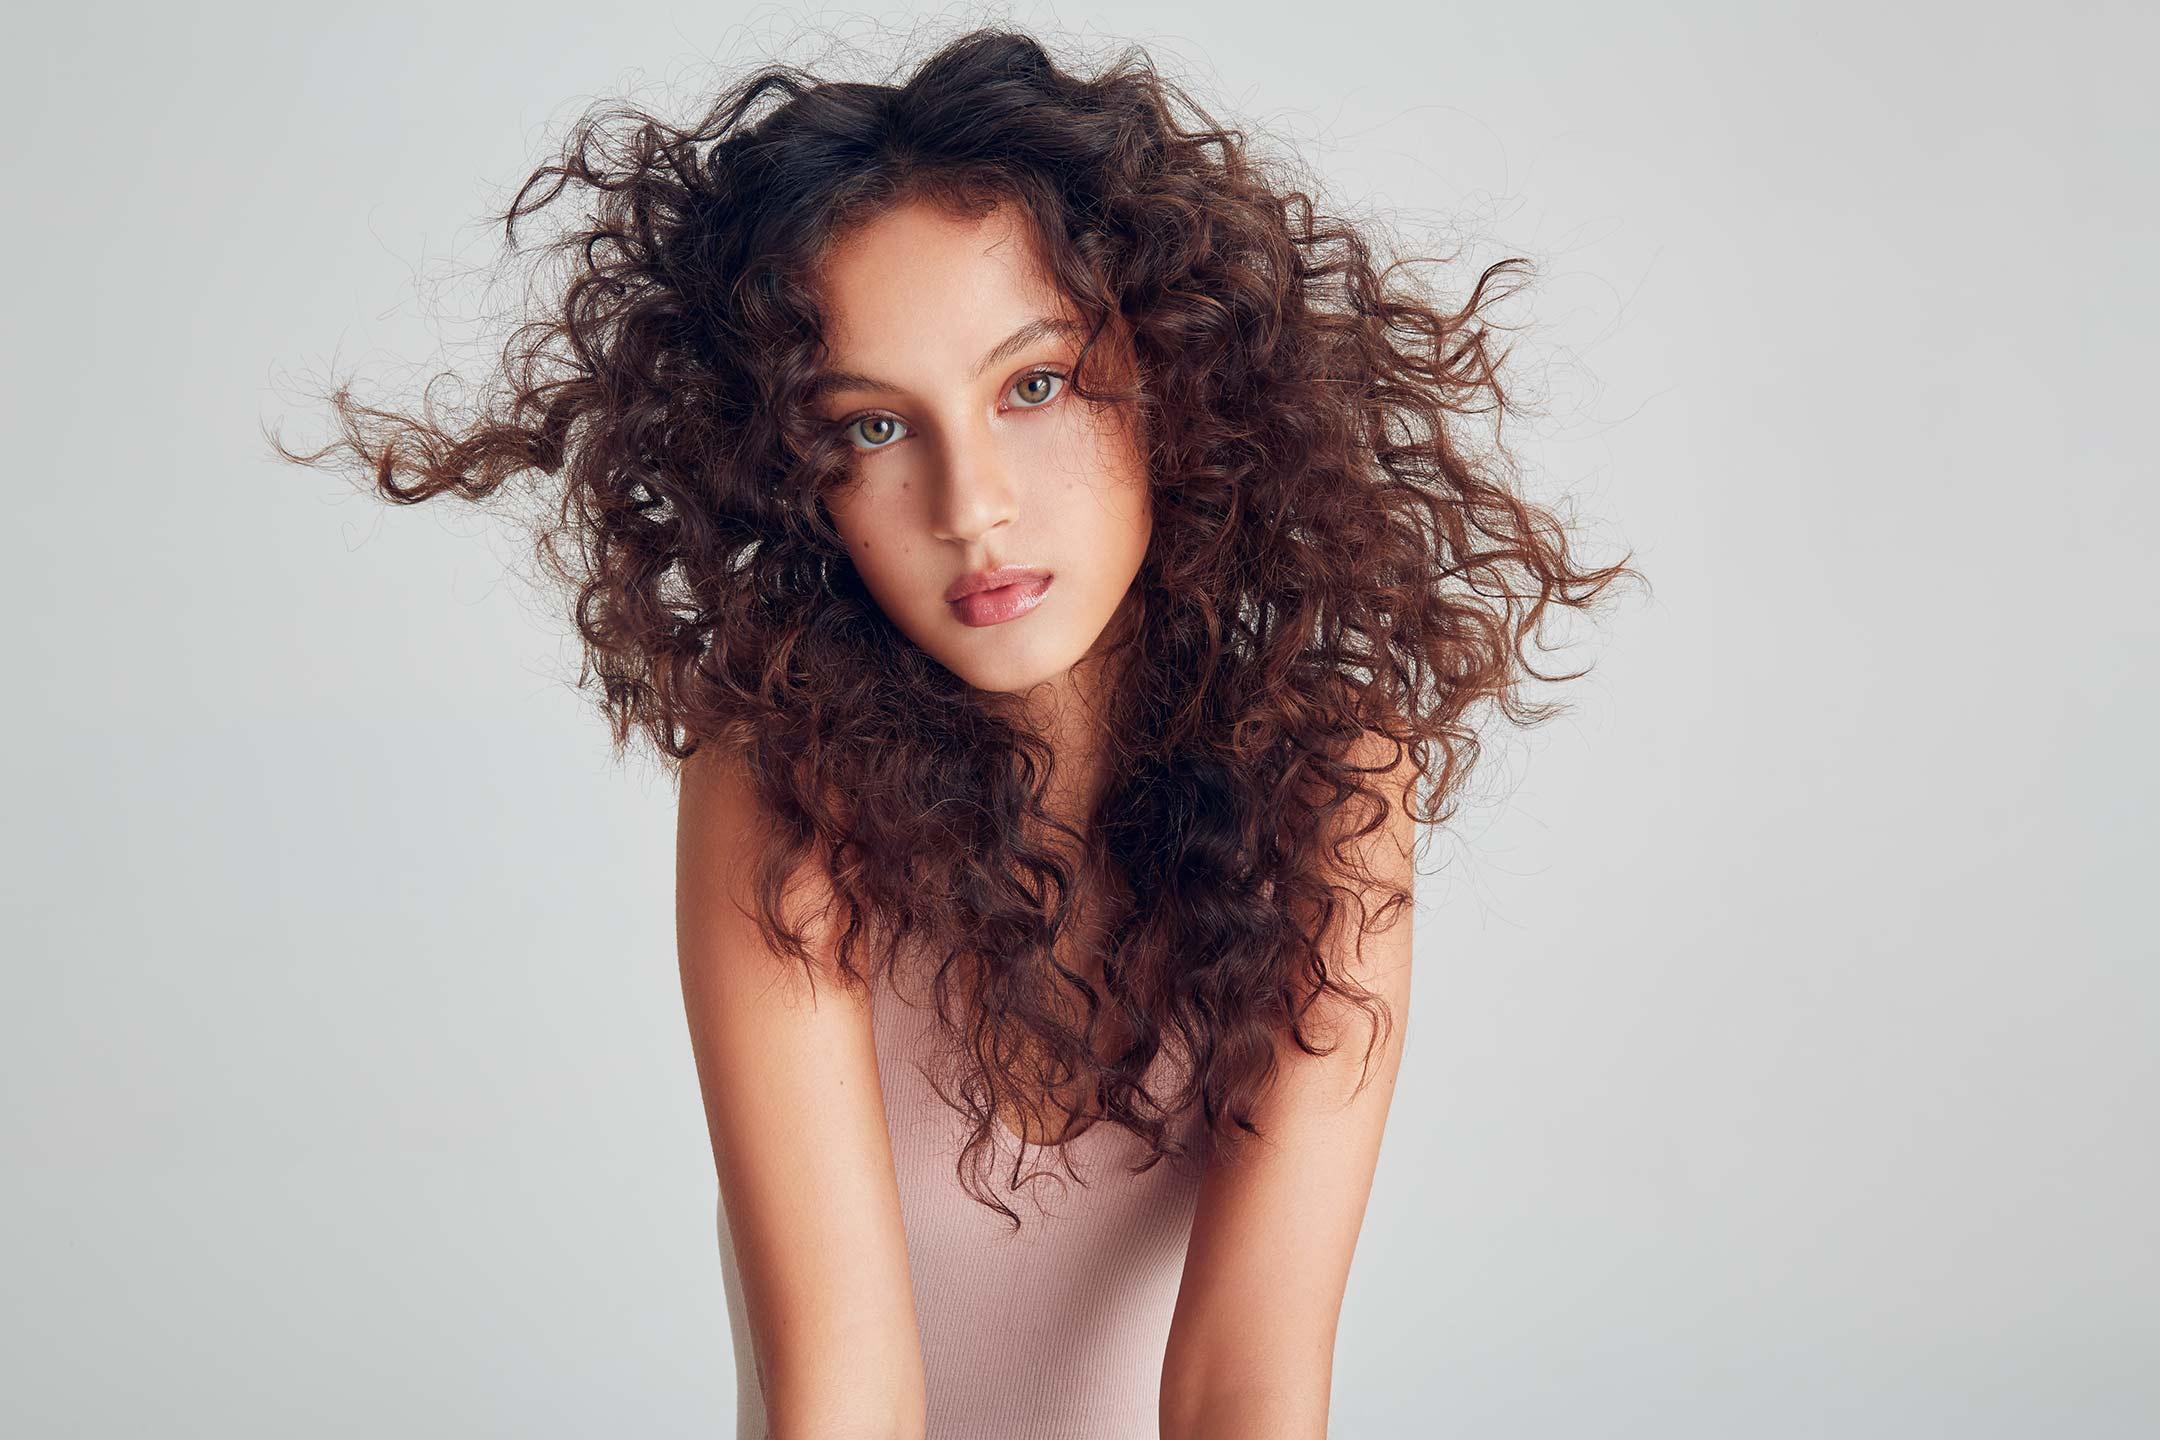 Natural Beauty Photography - Model Samantha Nixon I Greg Sorensen I Fashion & Beauty Photographer I NYC